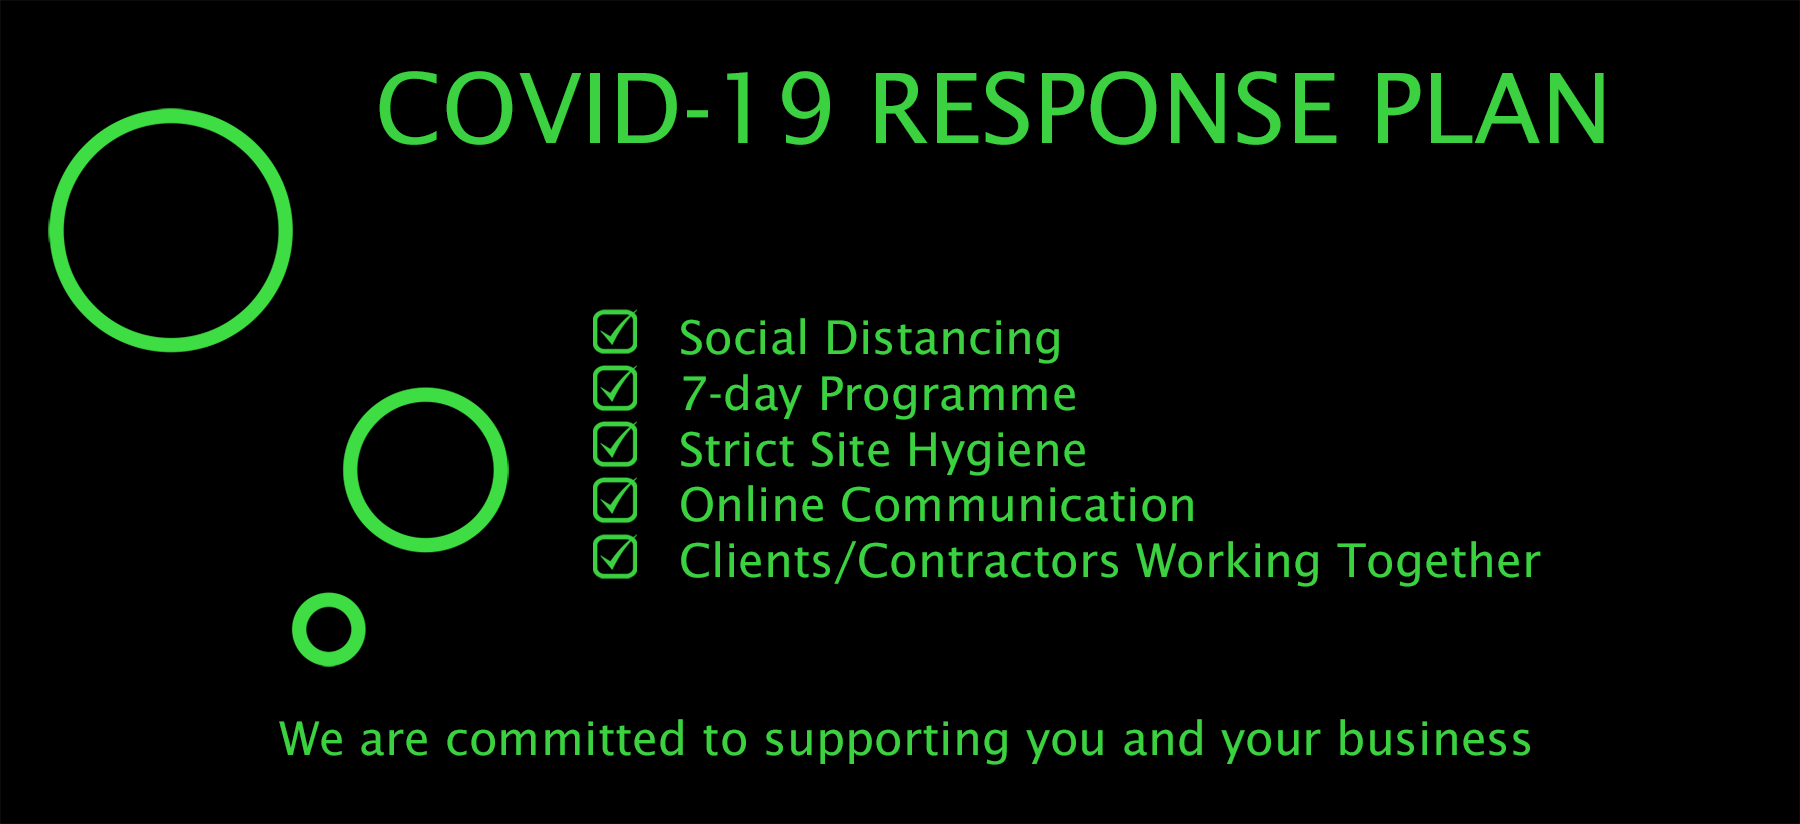 Green-core Covid-19 Response Plan